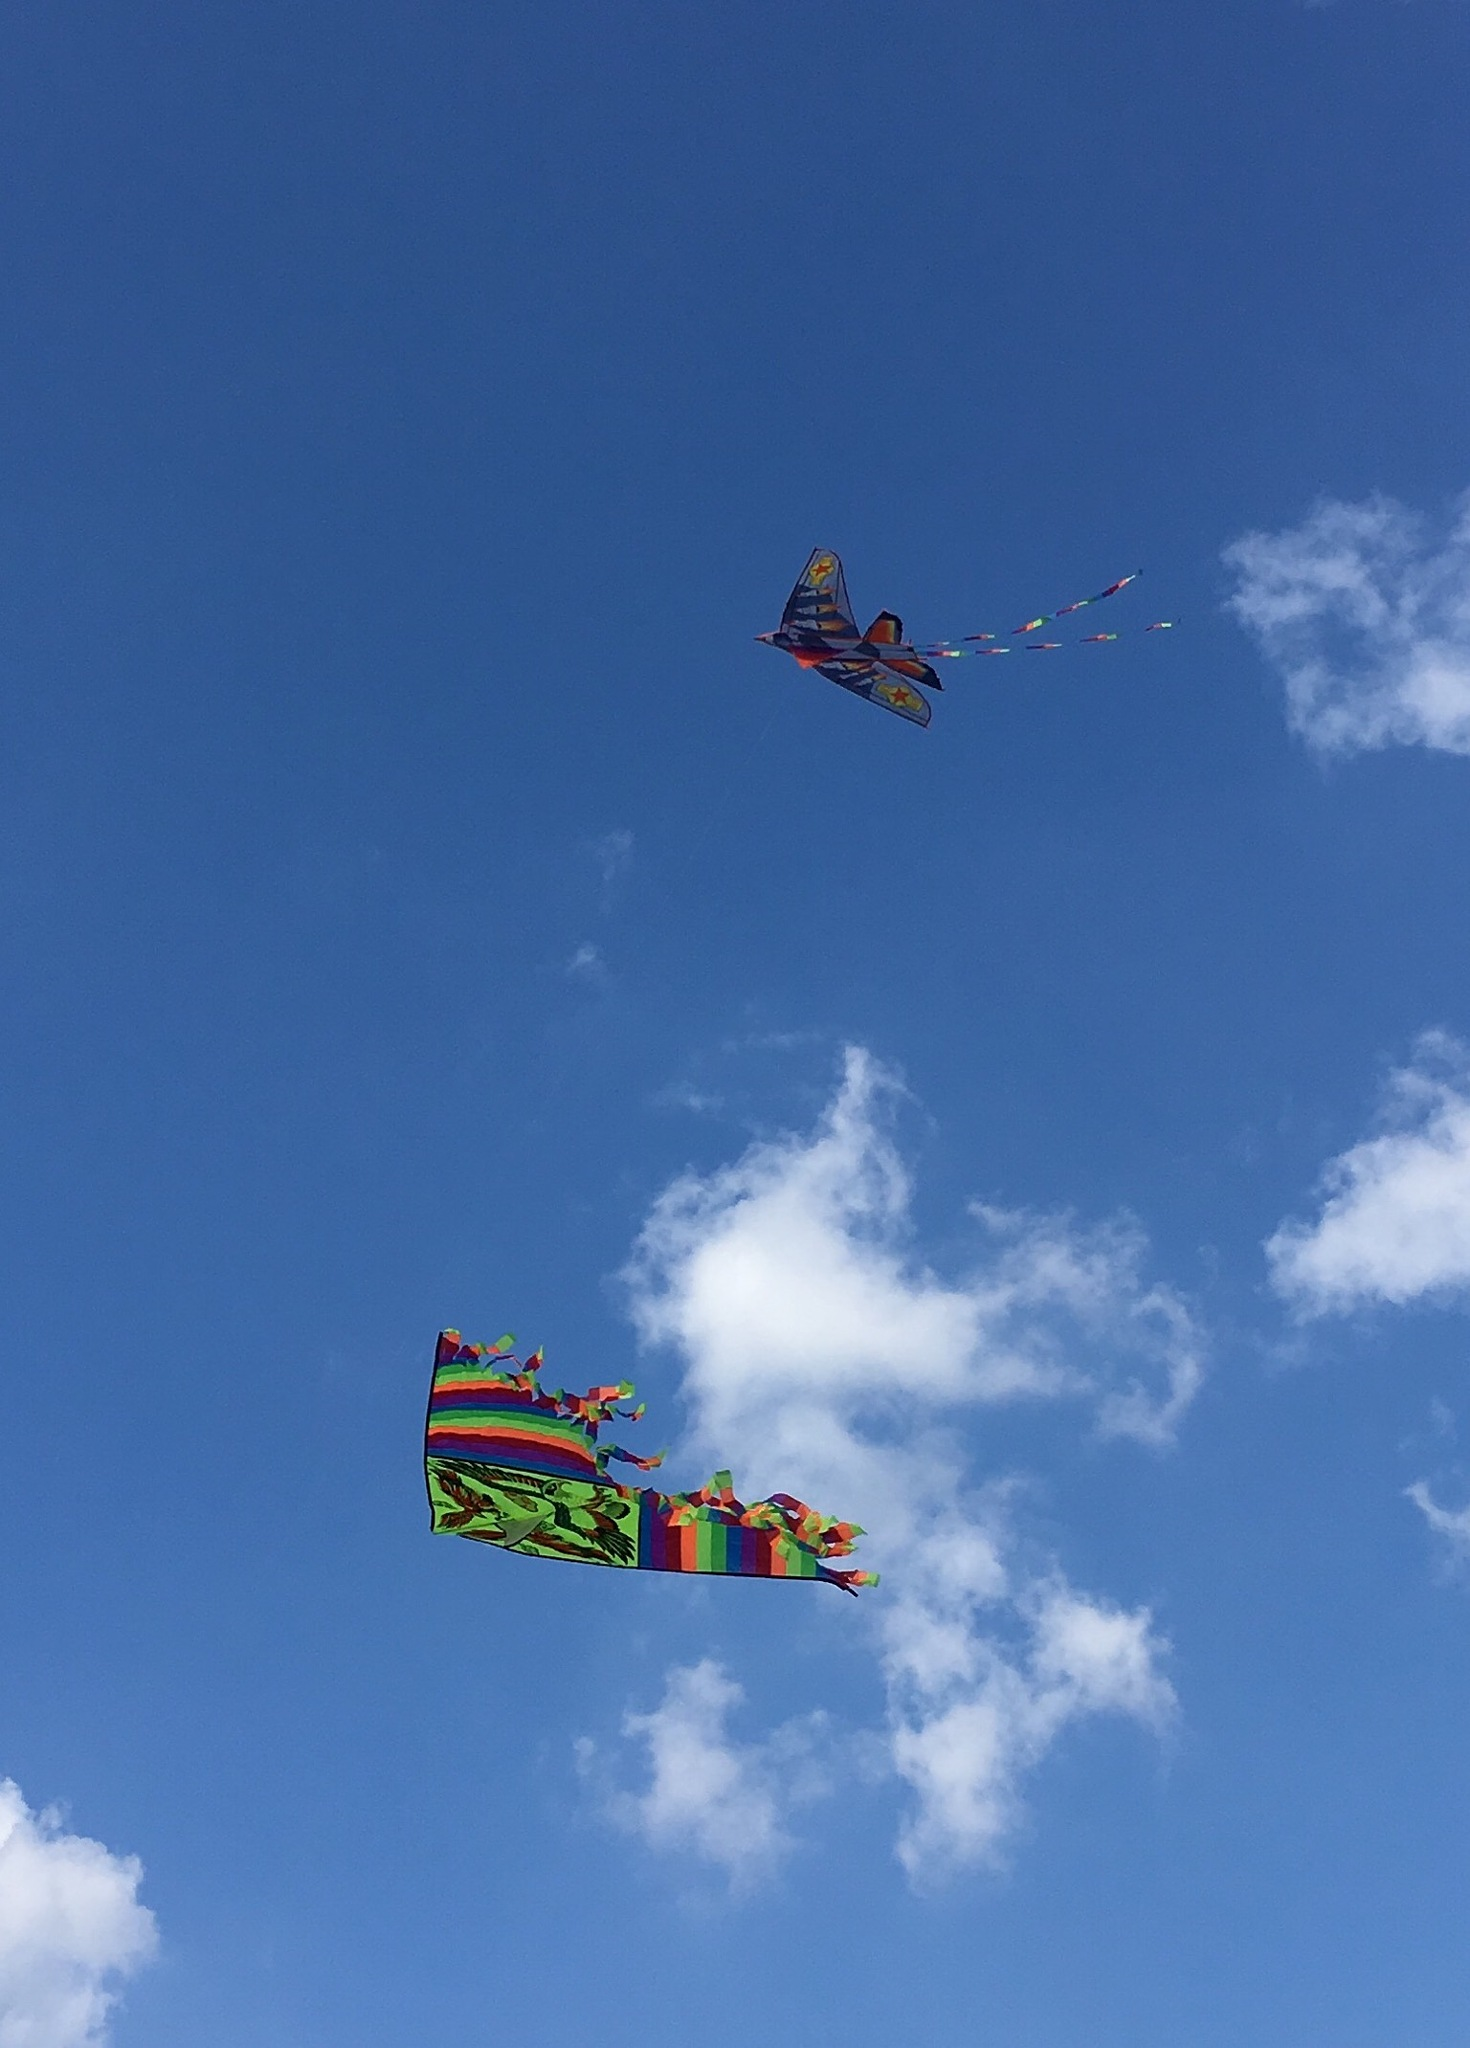 two kites in Moscow sky by Vladimir Pushkarev